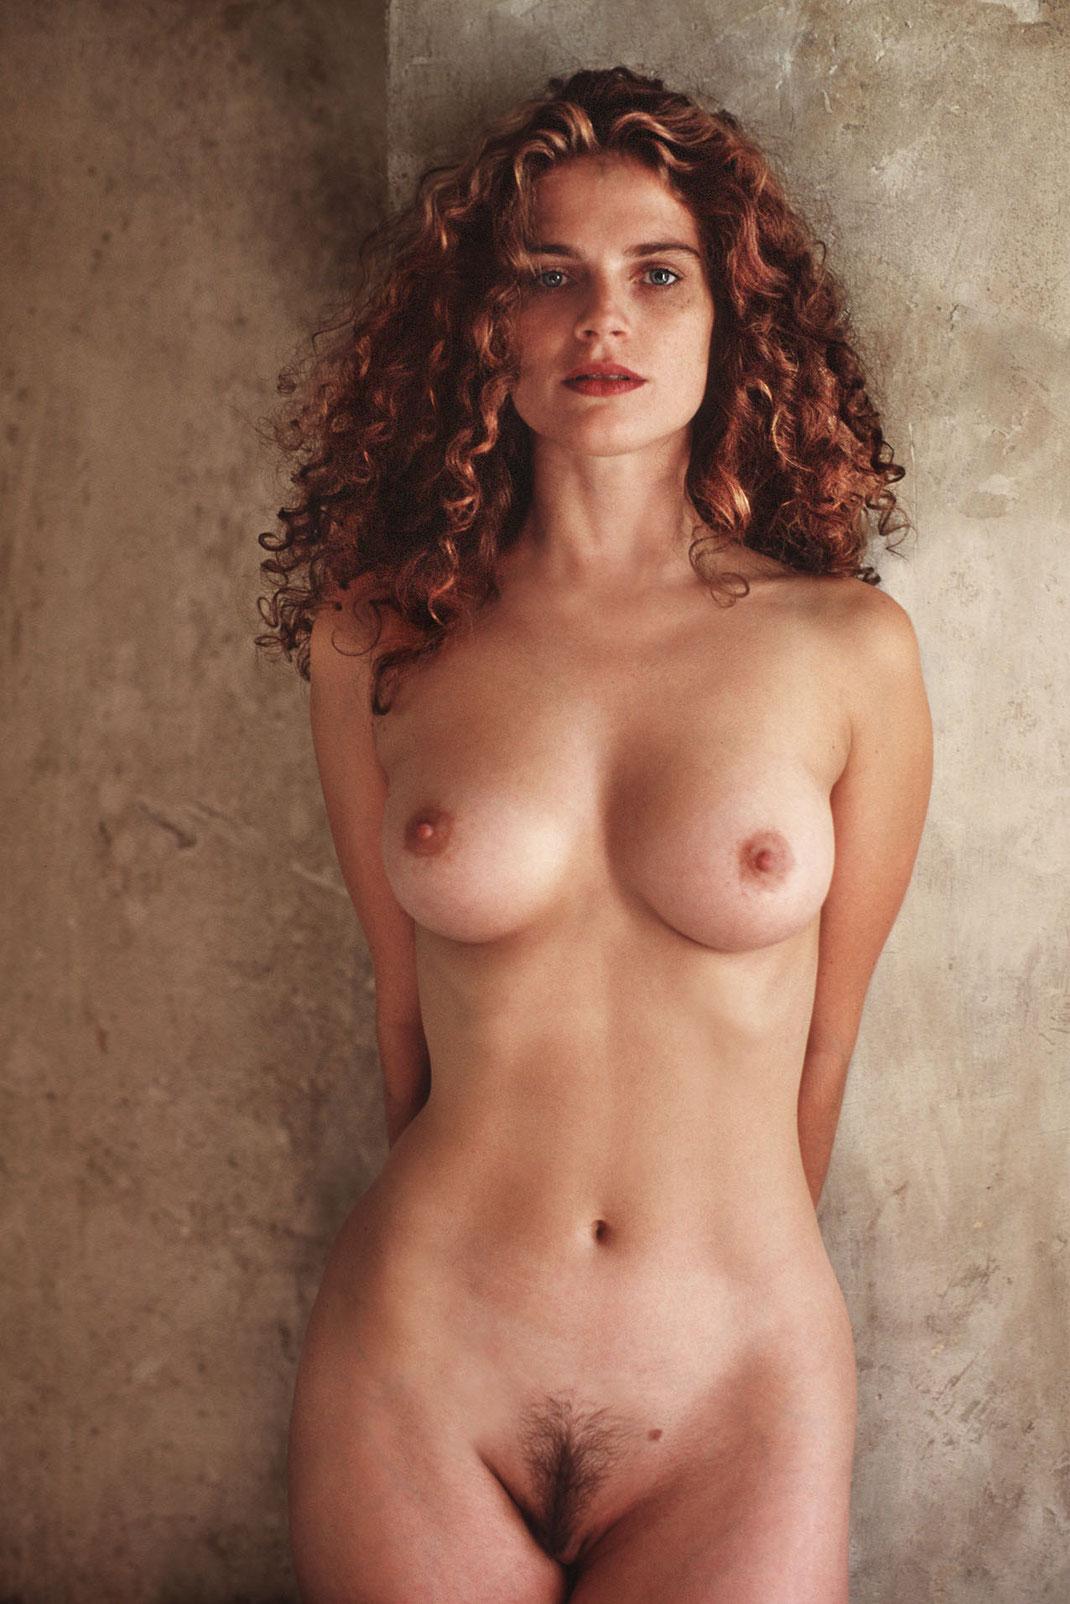 Fine Art Nude Photography by Martin Boelt